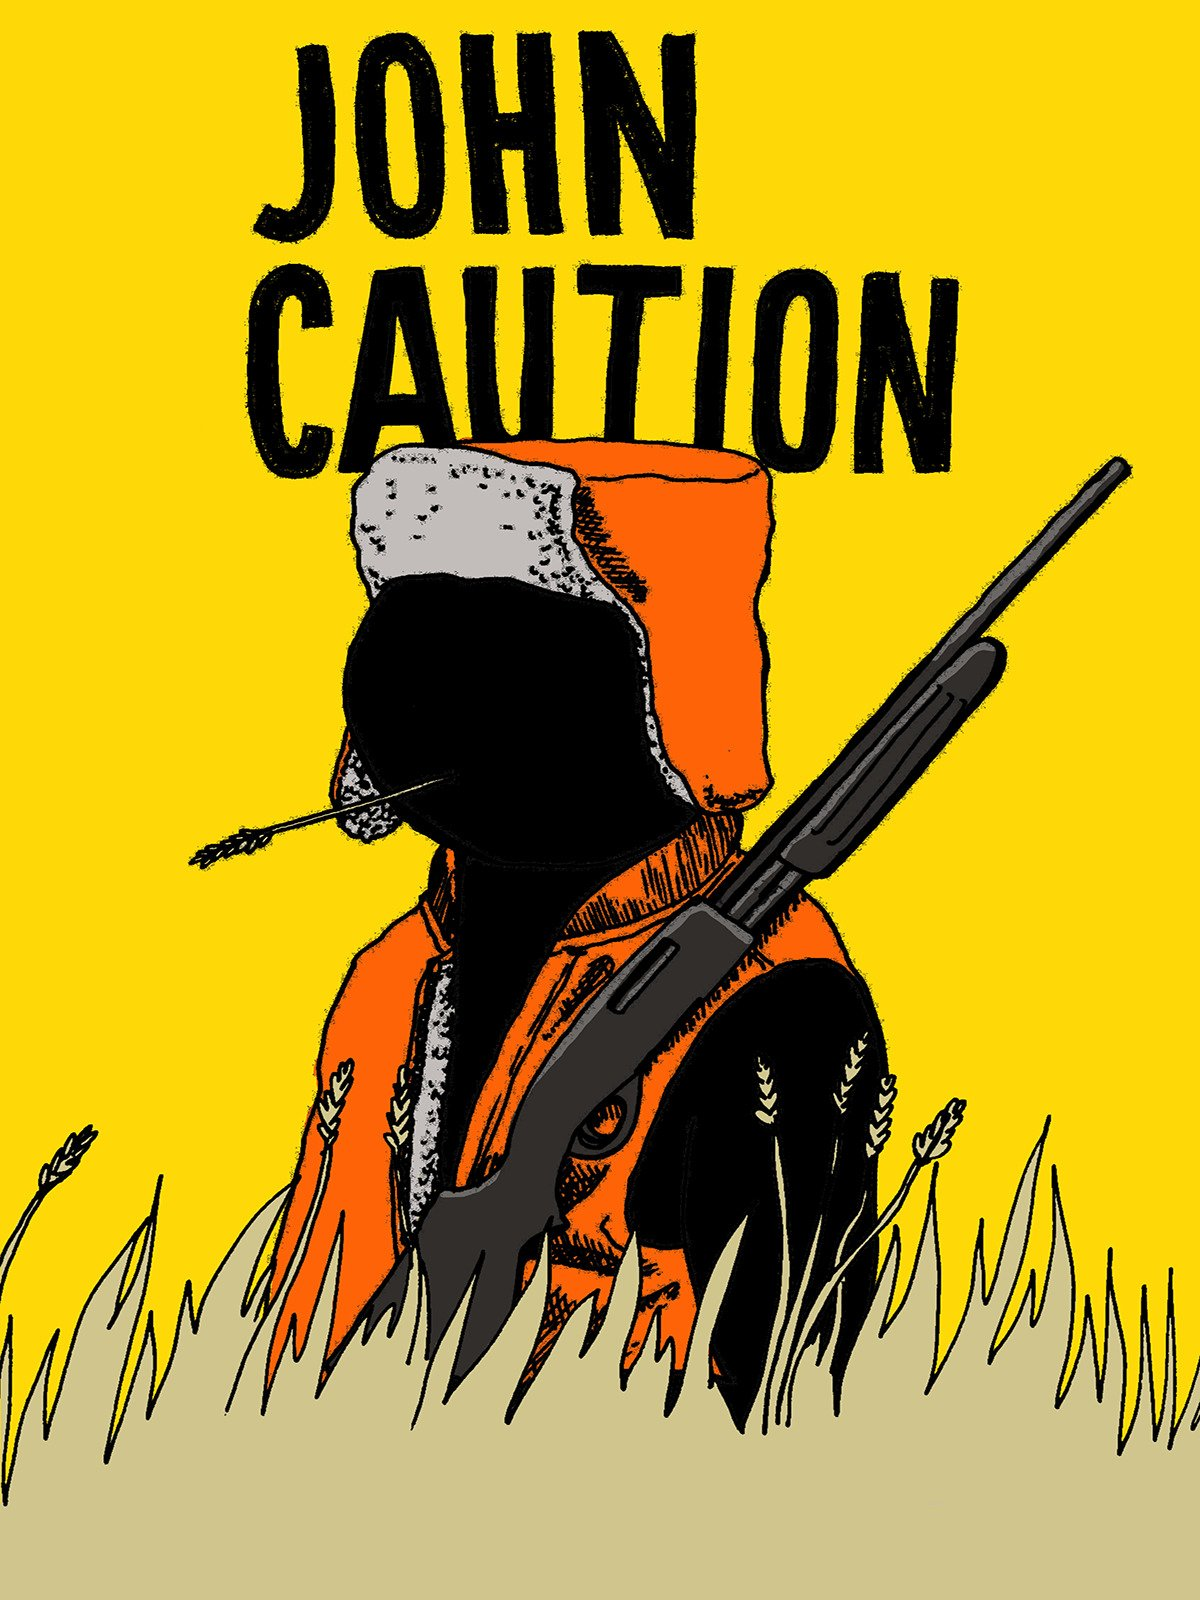 John Caution